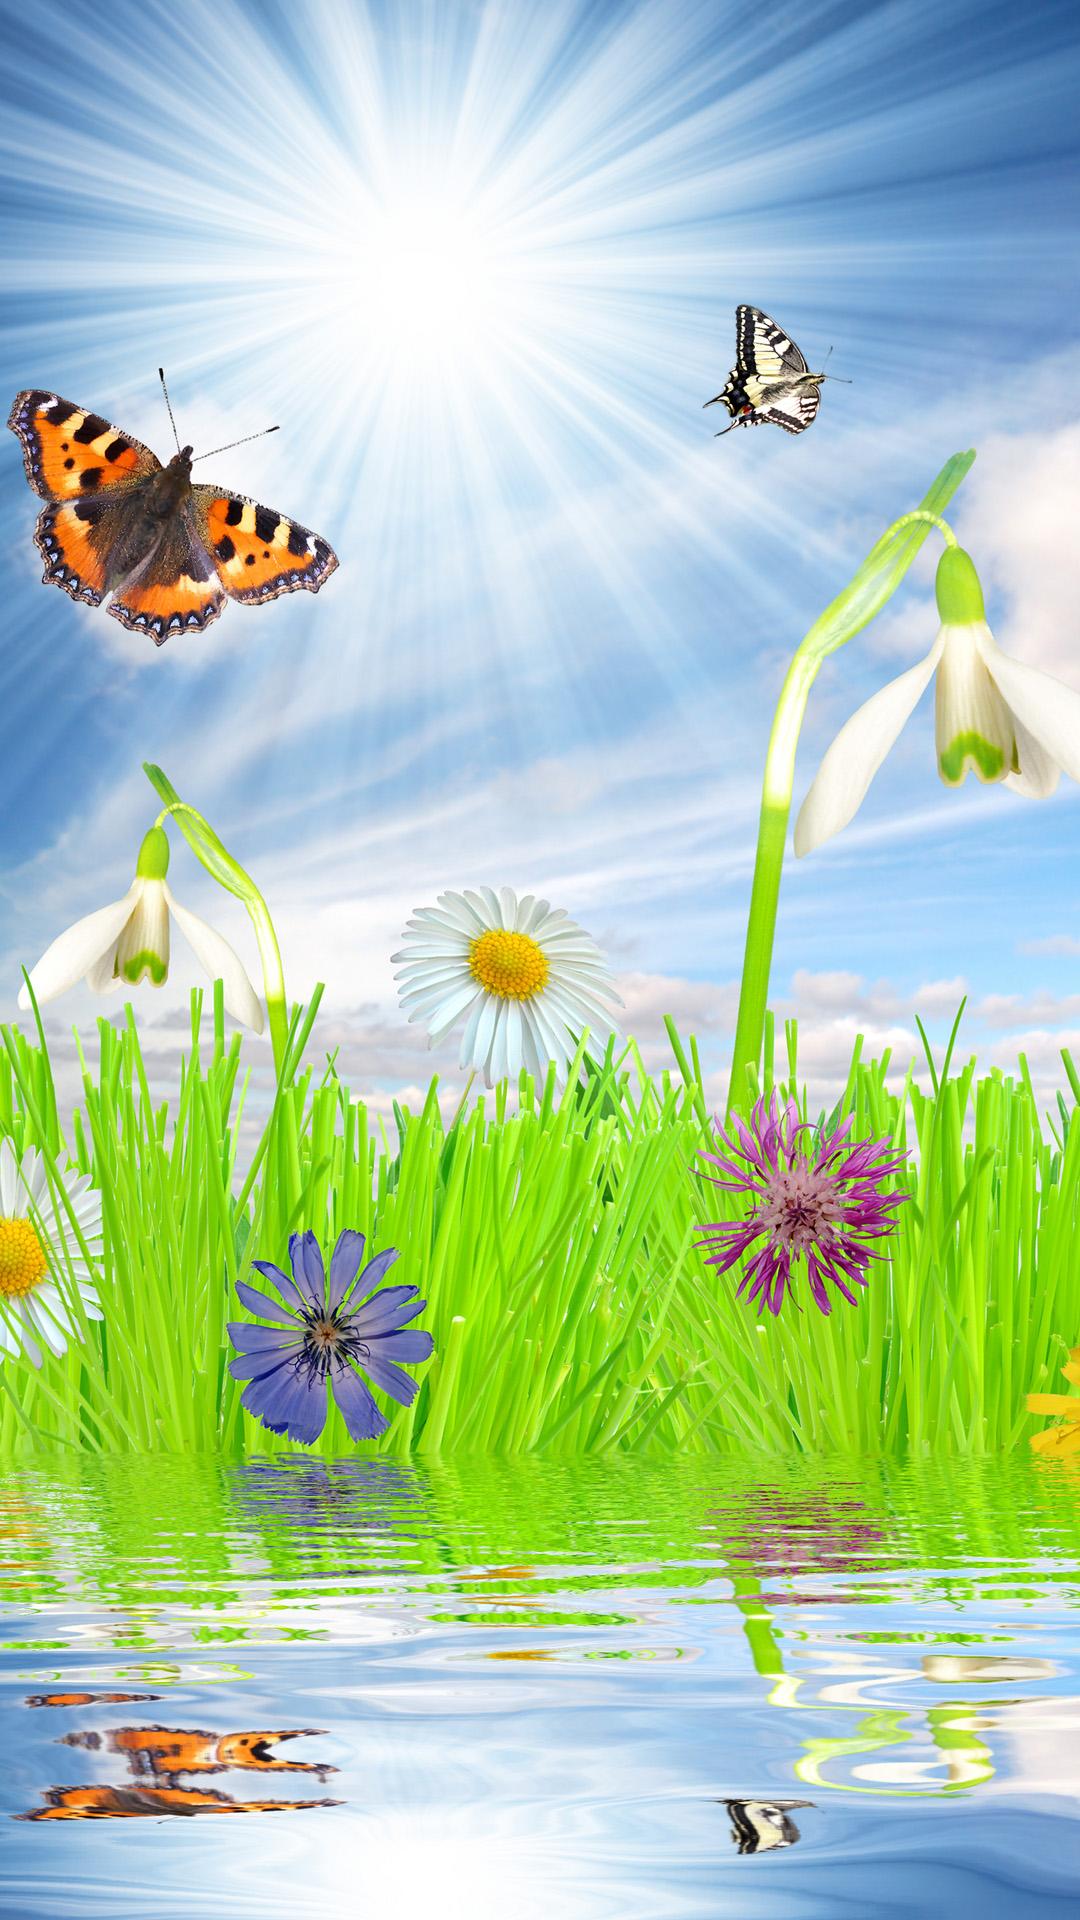 Beautiful spring mood iphone 6 plus wallpaper iPhone 6 Plus 1080x1920